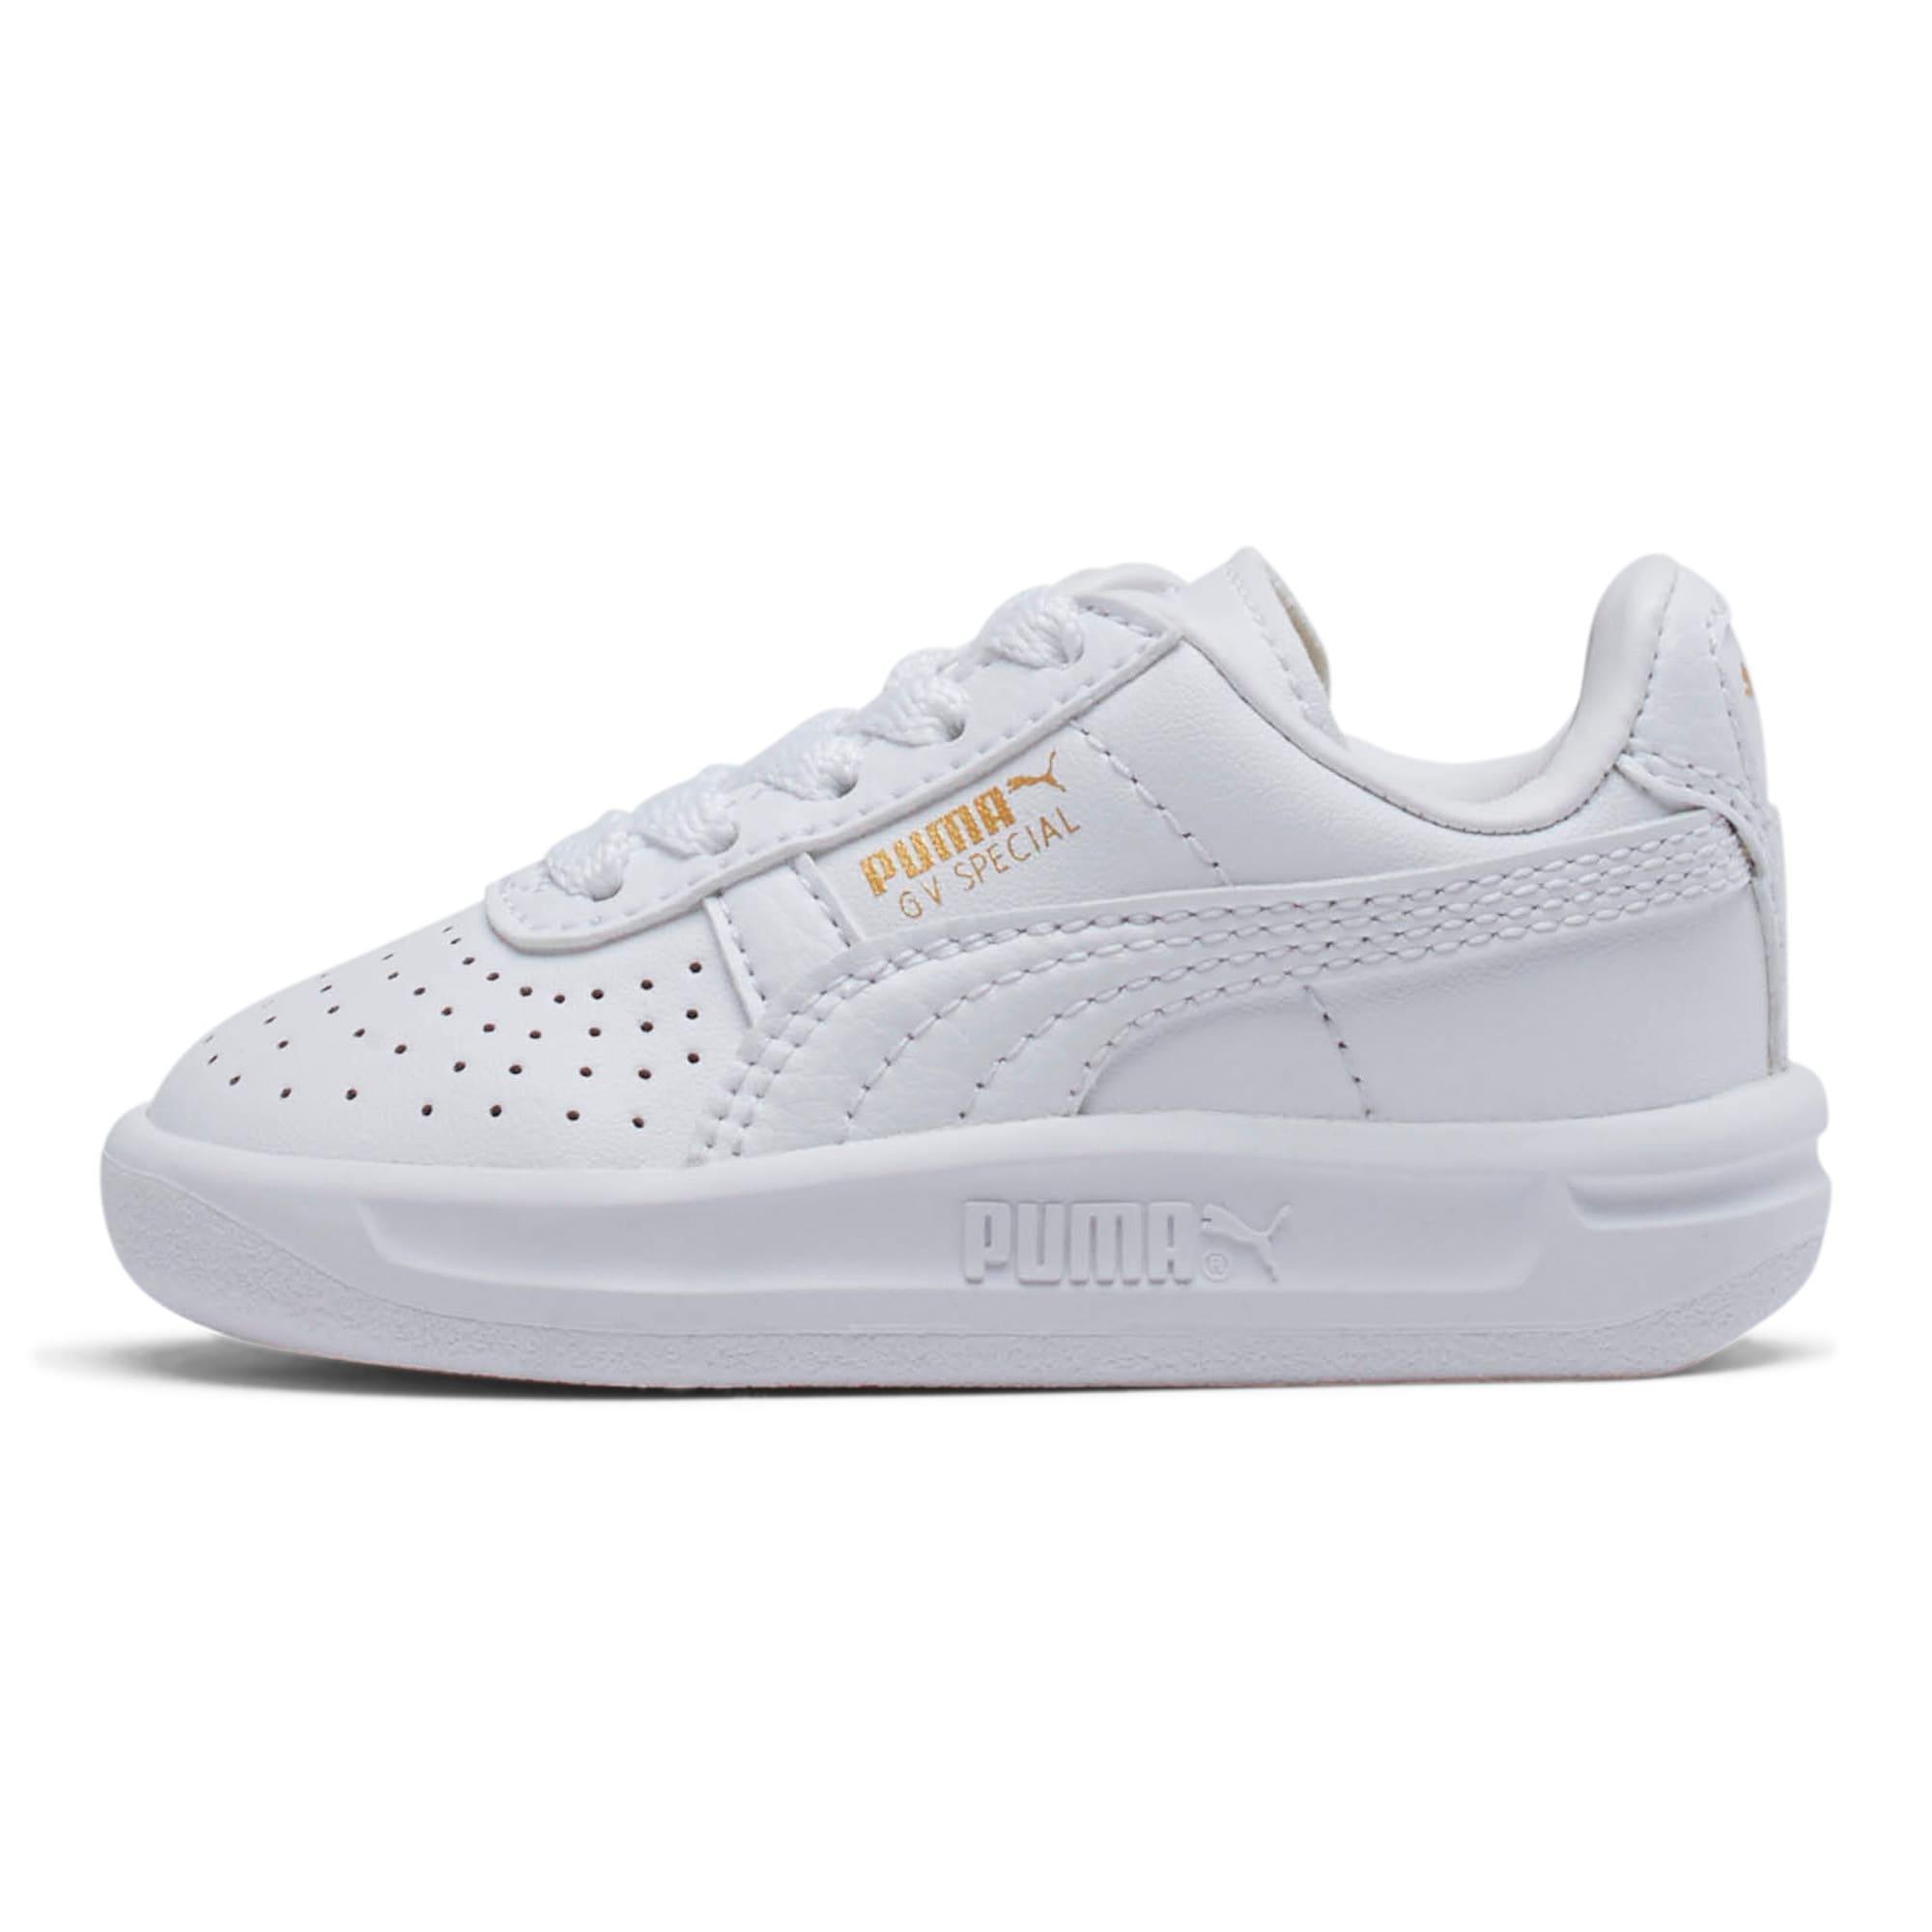 Thumbnail 1 of GV Special Toddler Shoes, Puma White-Puma Team Gold, medium